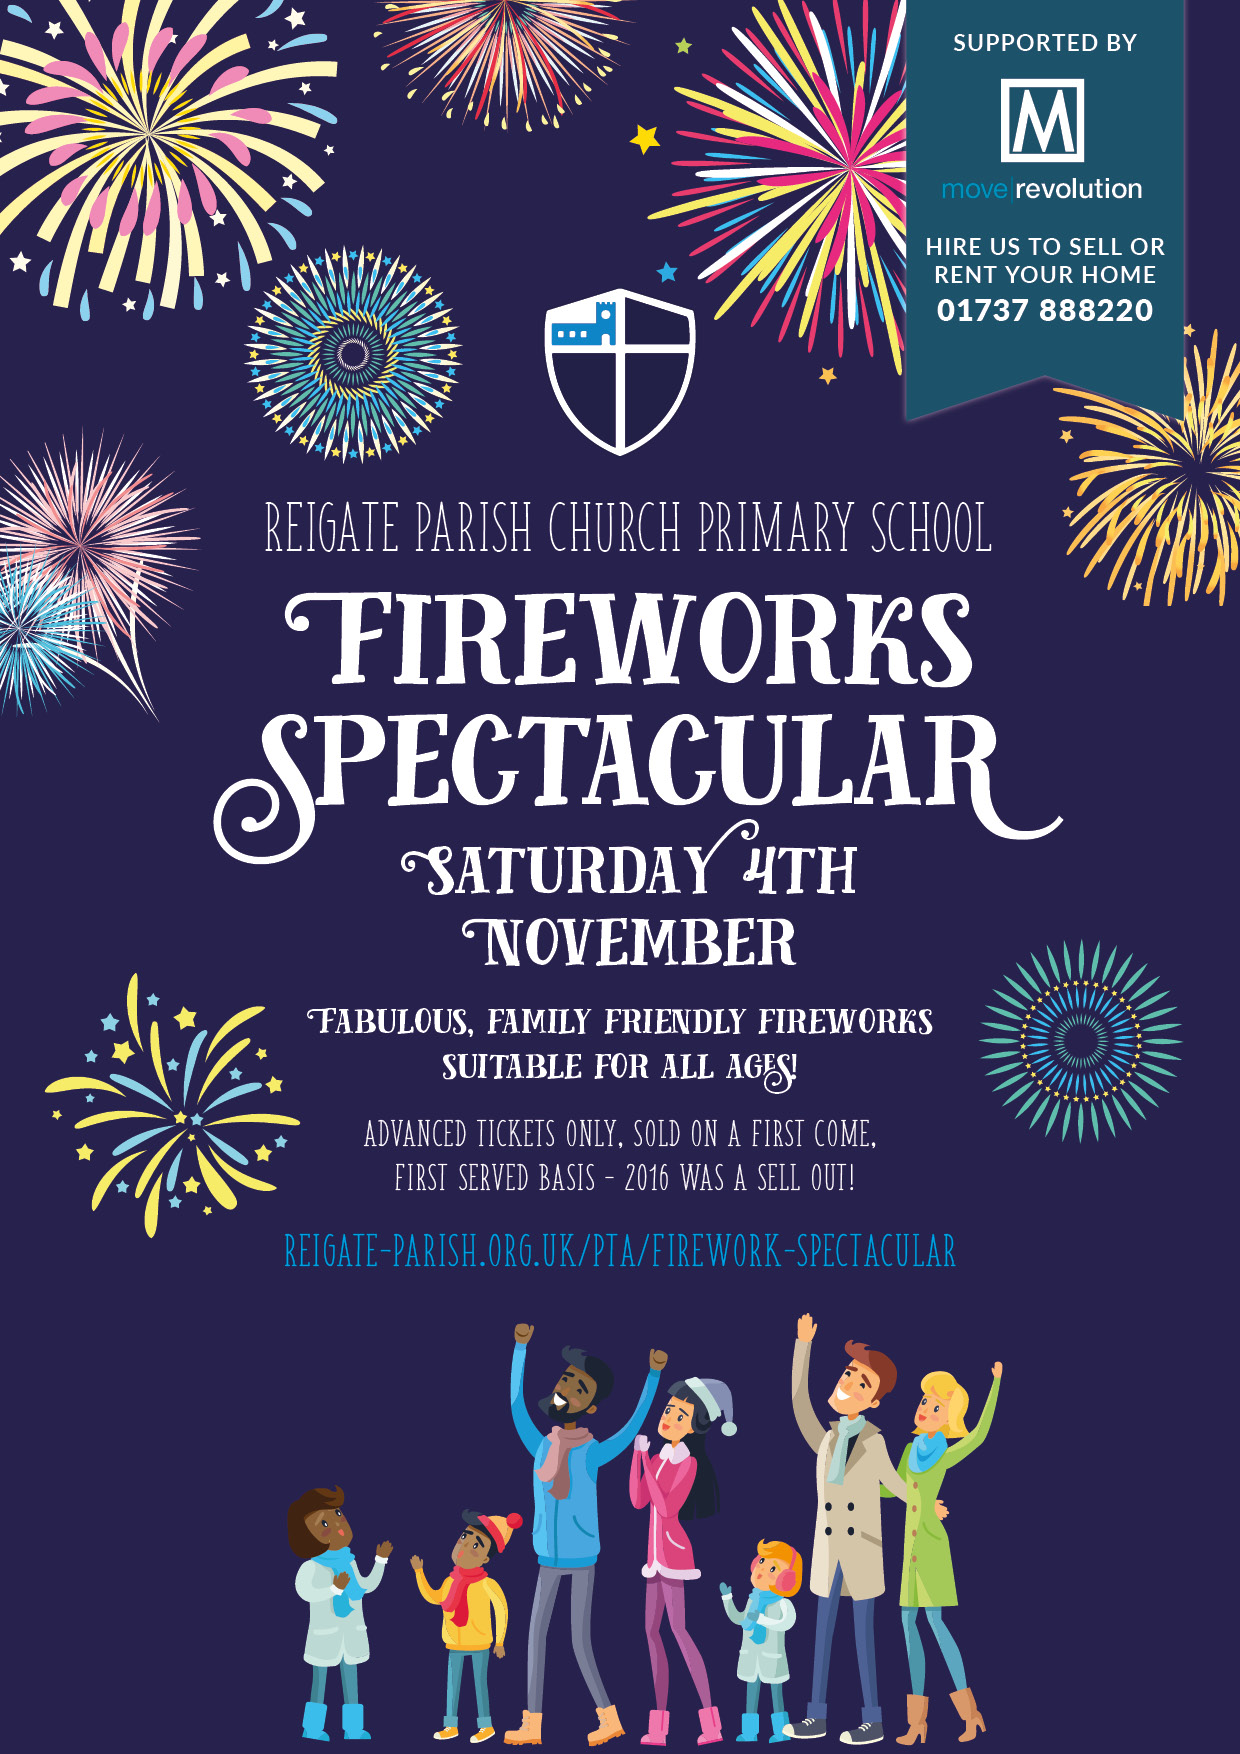 family fireworks in reigate - move revolution